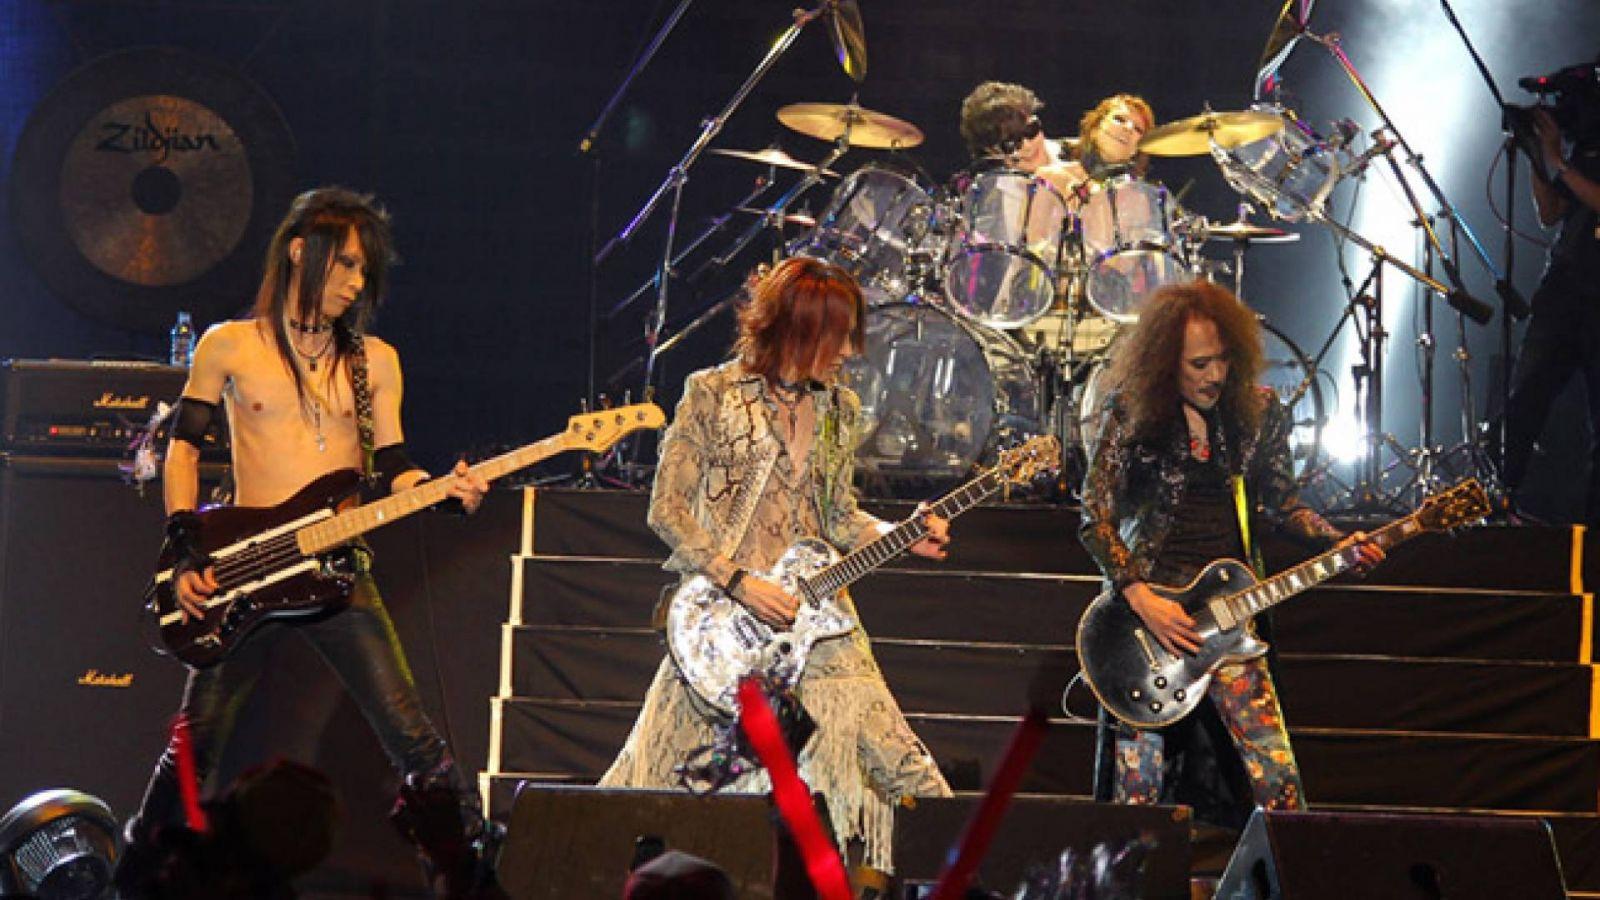 X JAPAN 2011 世界巡回演唱会香港站 © X Japan